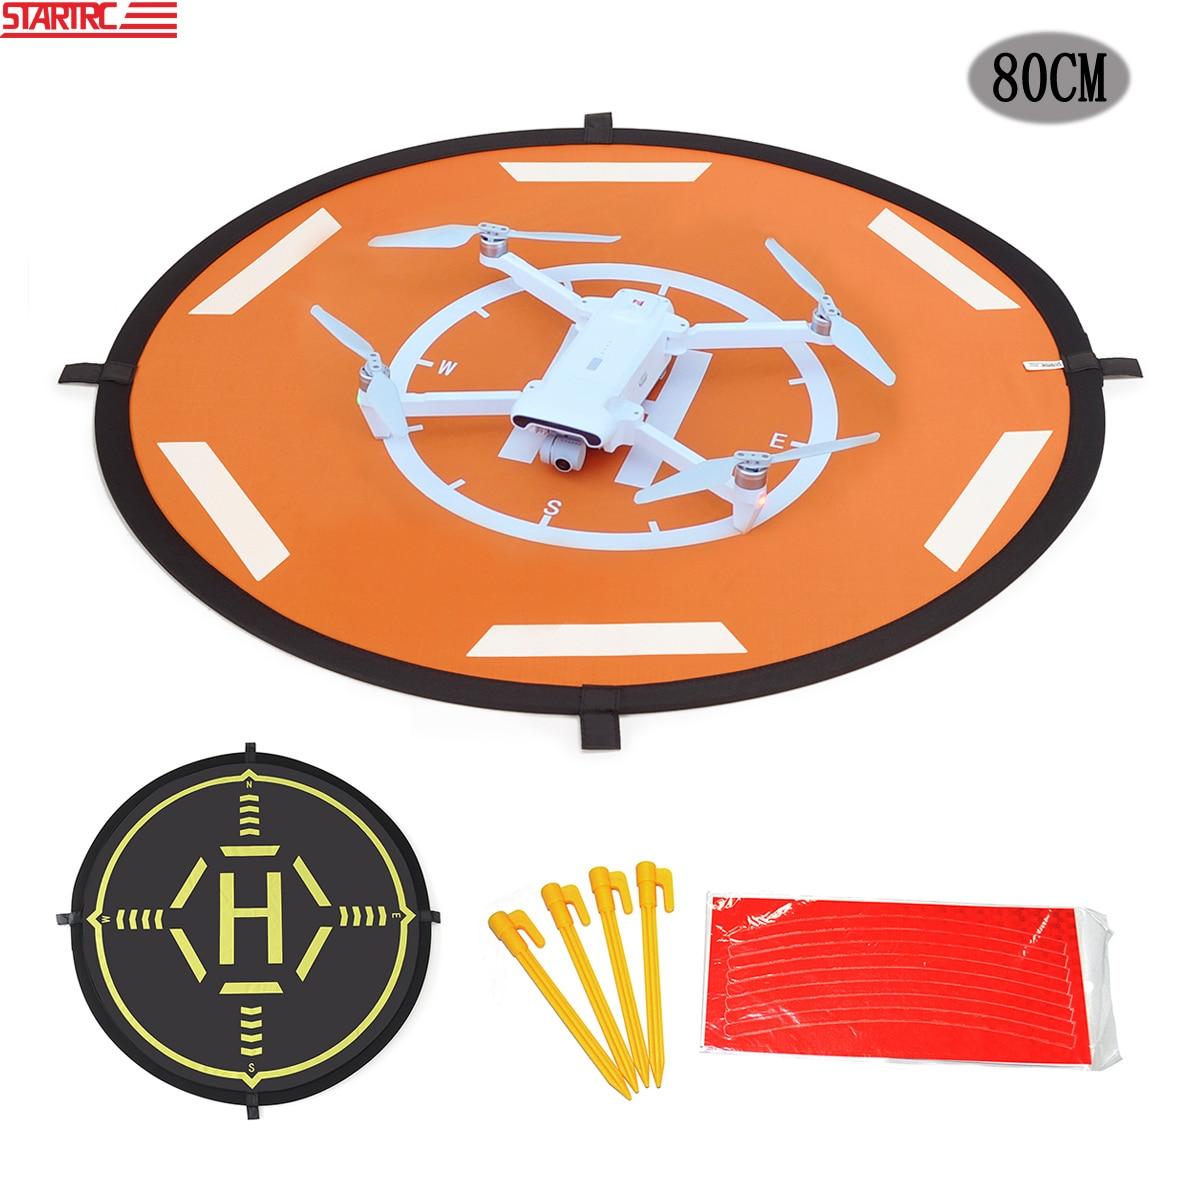 STARTRC FIMI X8 SE 2020 drone camera Landing pad safely landing 80CM For XIAO MI FIMI X8SE 2020/ 4K / A3 Accessories